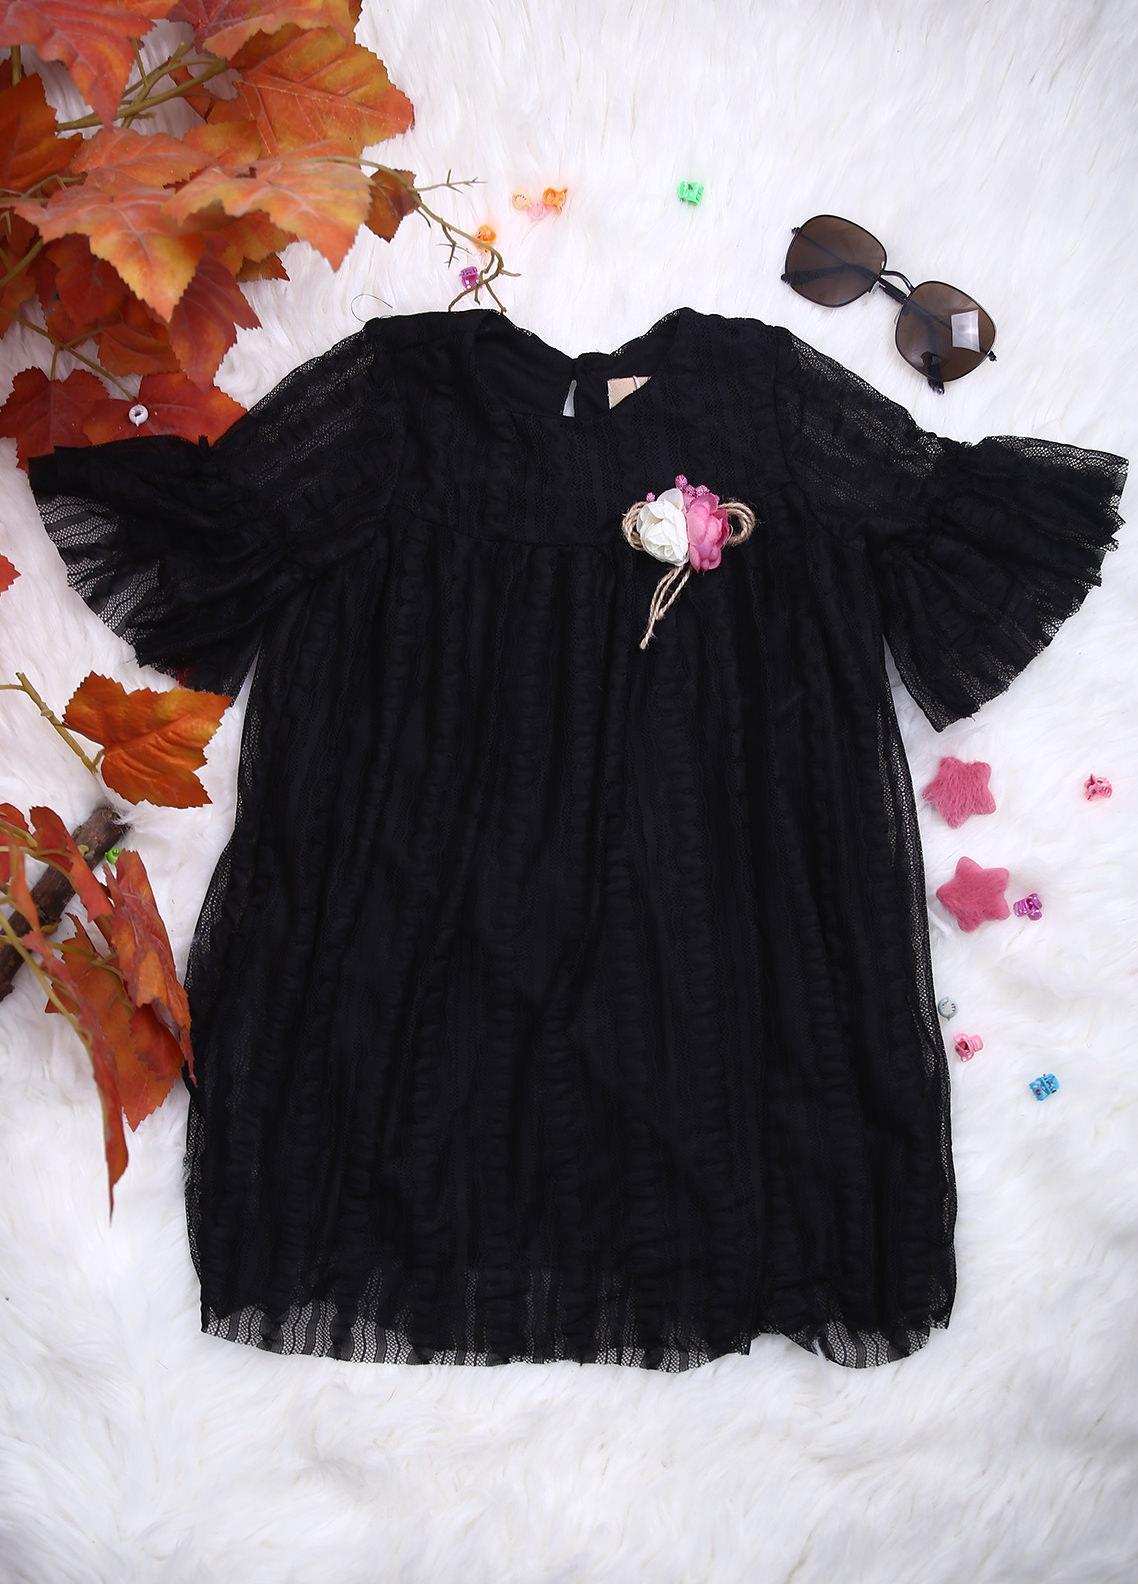 Sanaulla Exclusive Range Net Casual Girls Frocks -  112508 Black